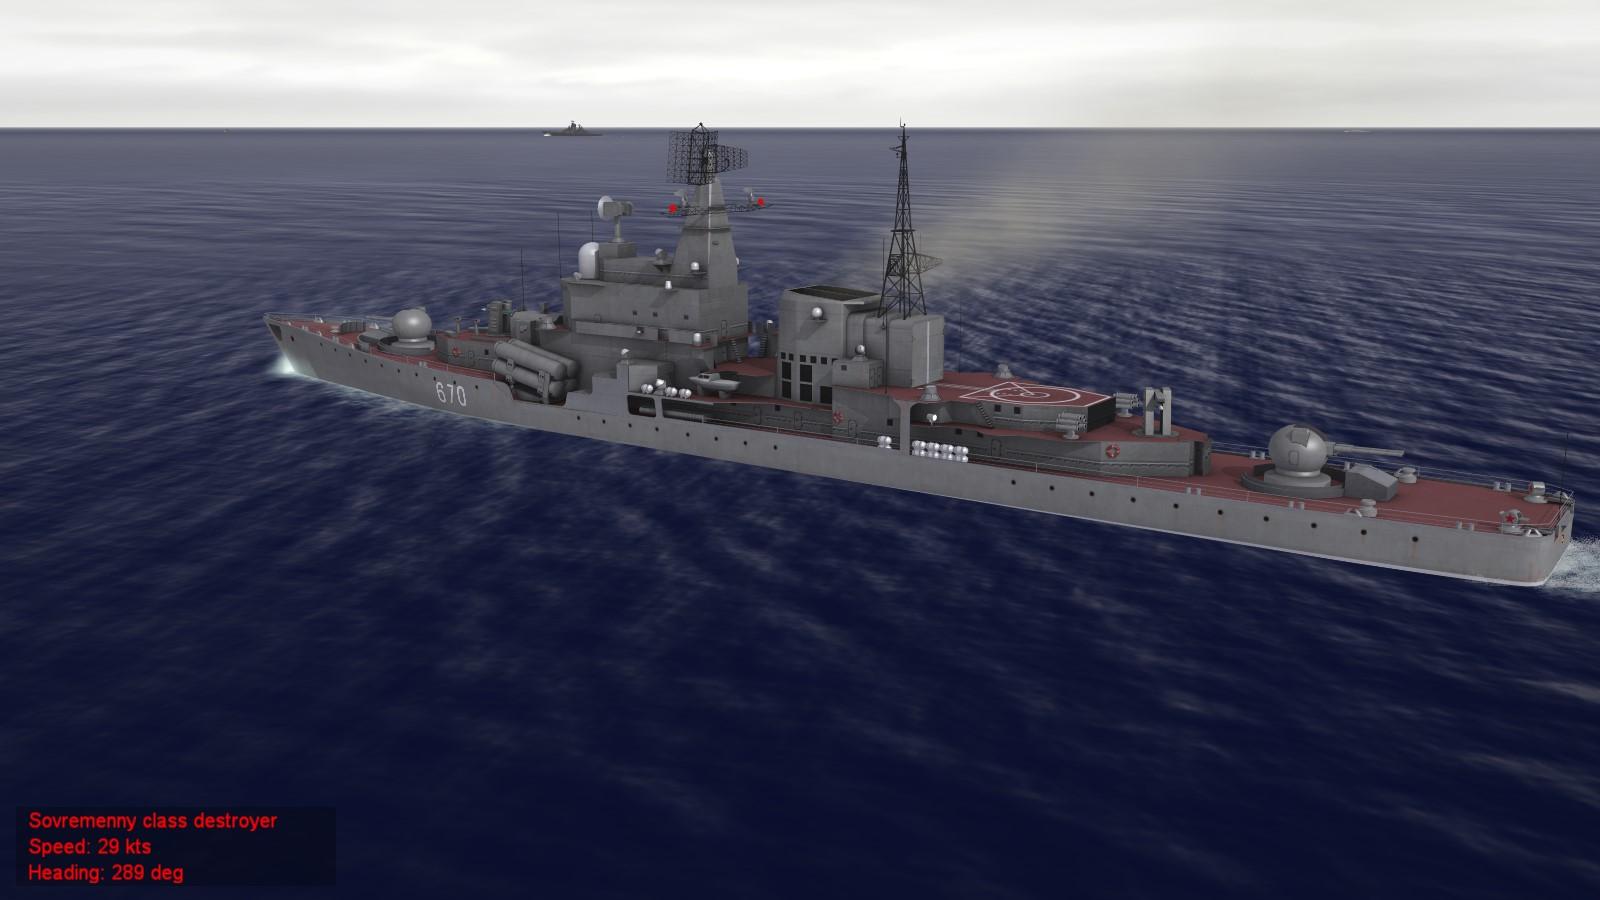 Sovremenny class destroyer